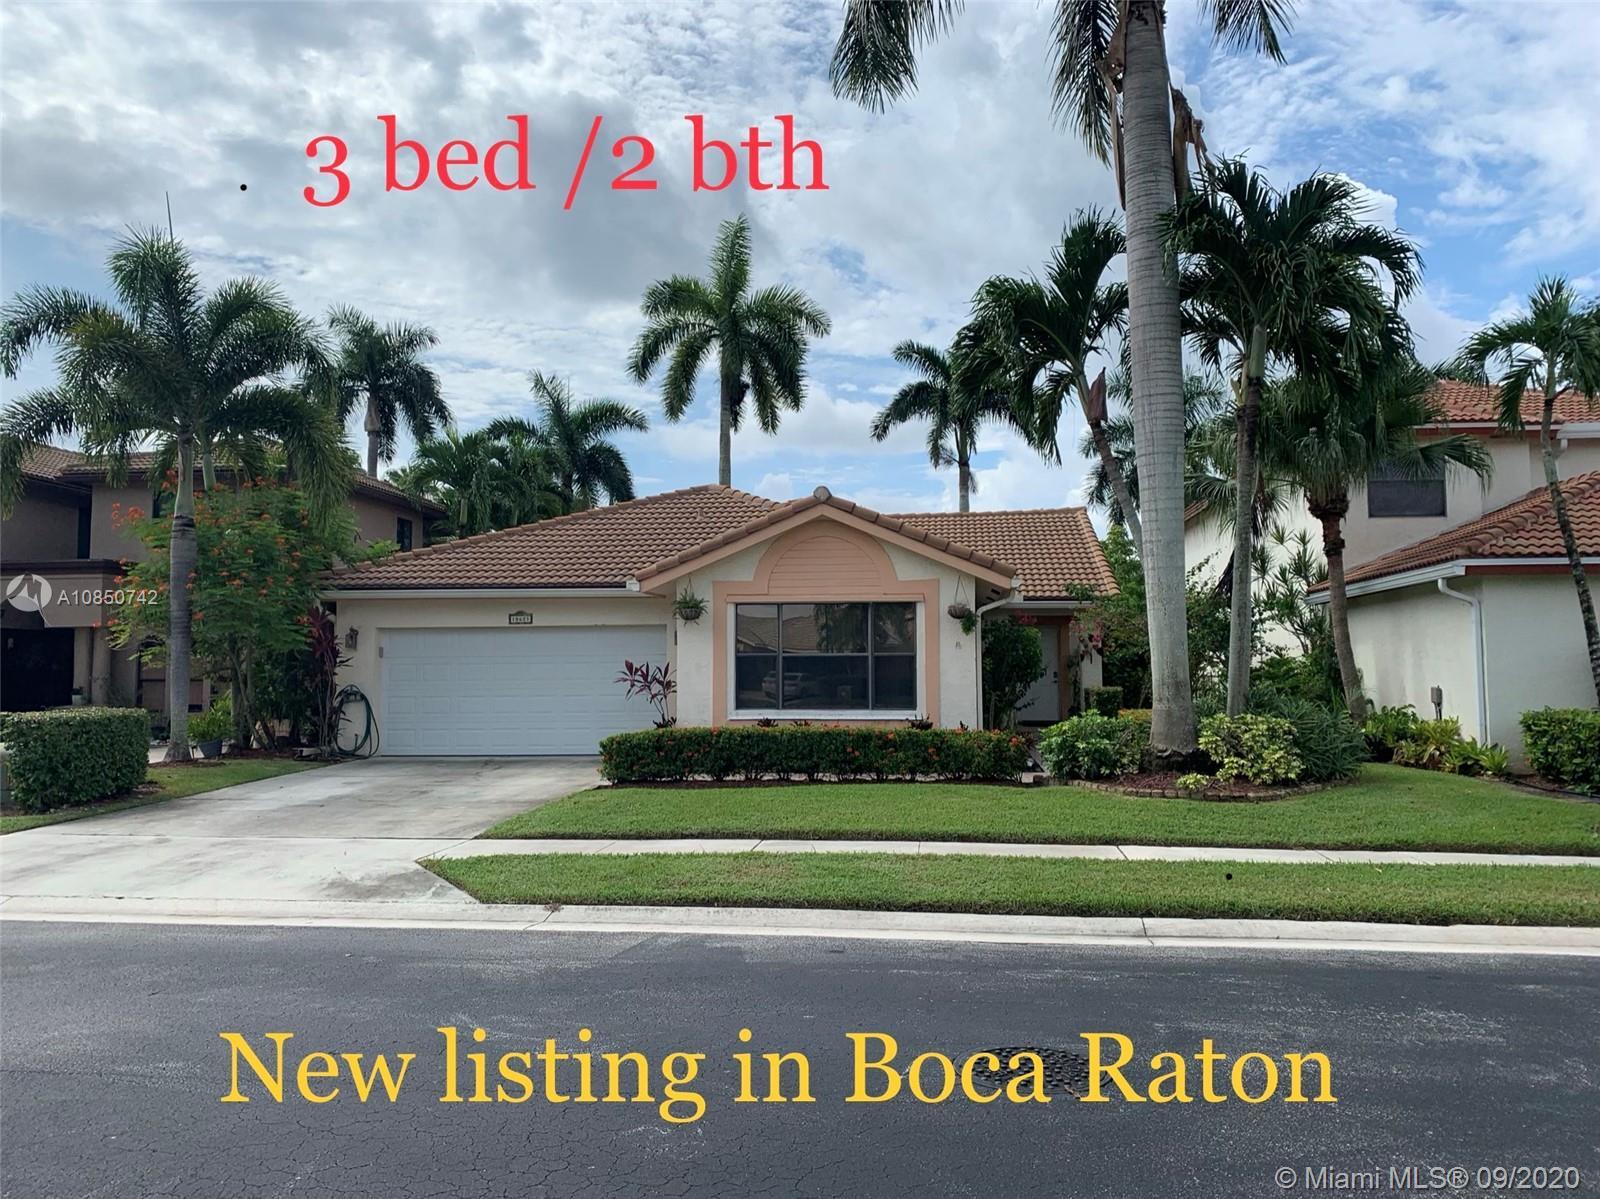 10621 Mendocino Ln, Boca Raton, FL 33428